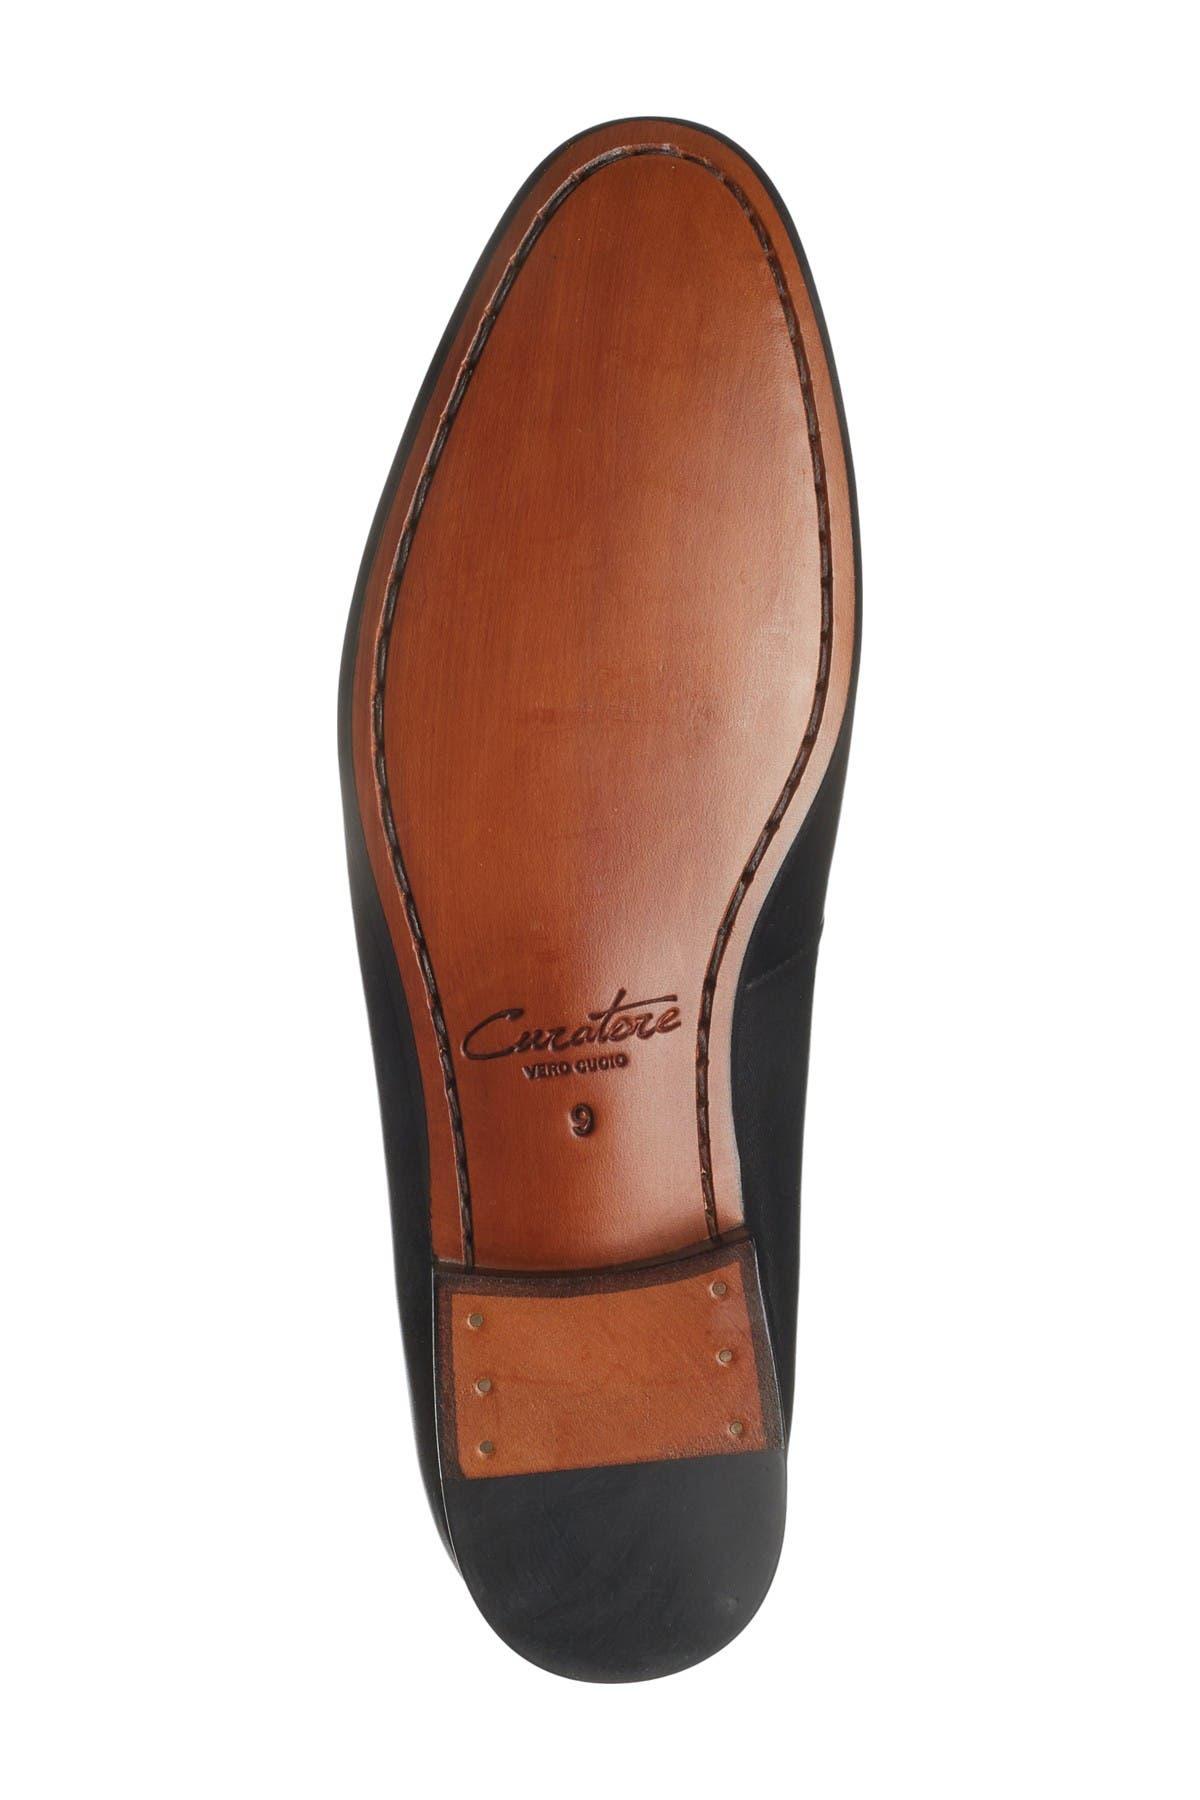 Curatore Armatto Leather Penny Loafer